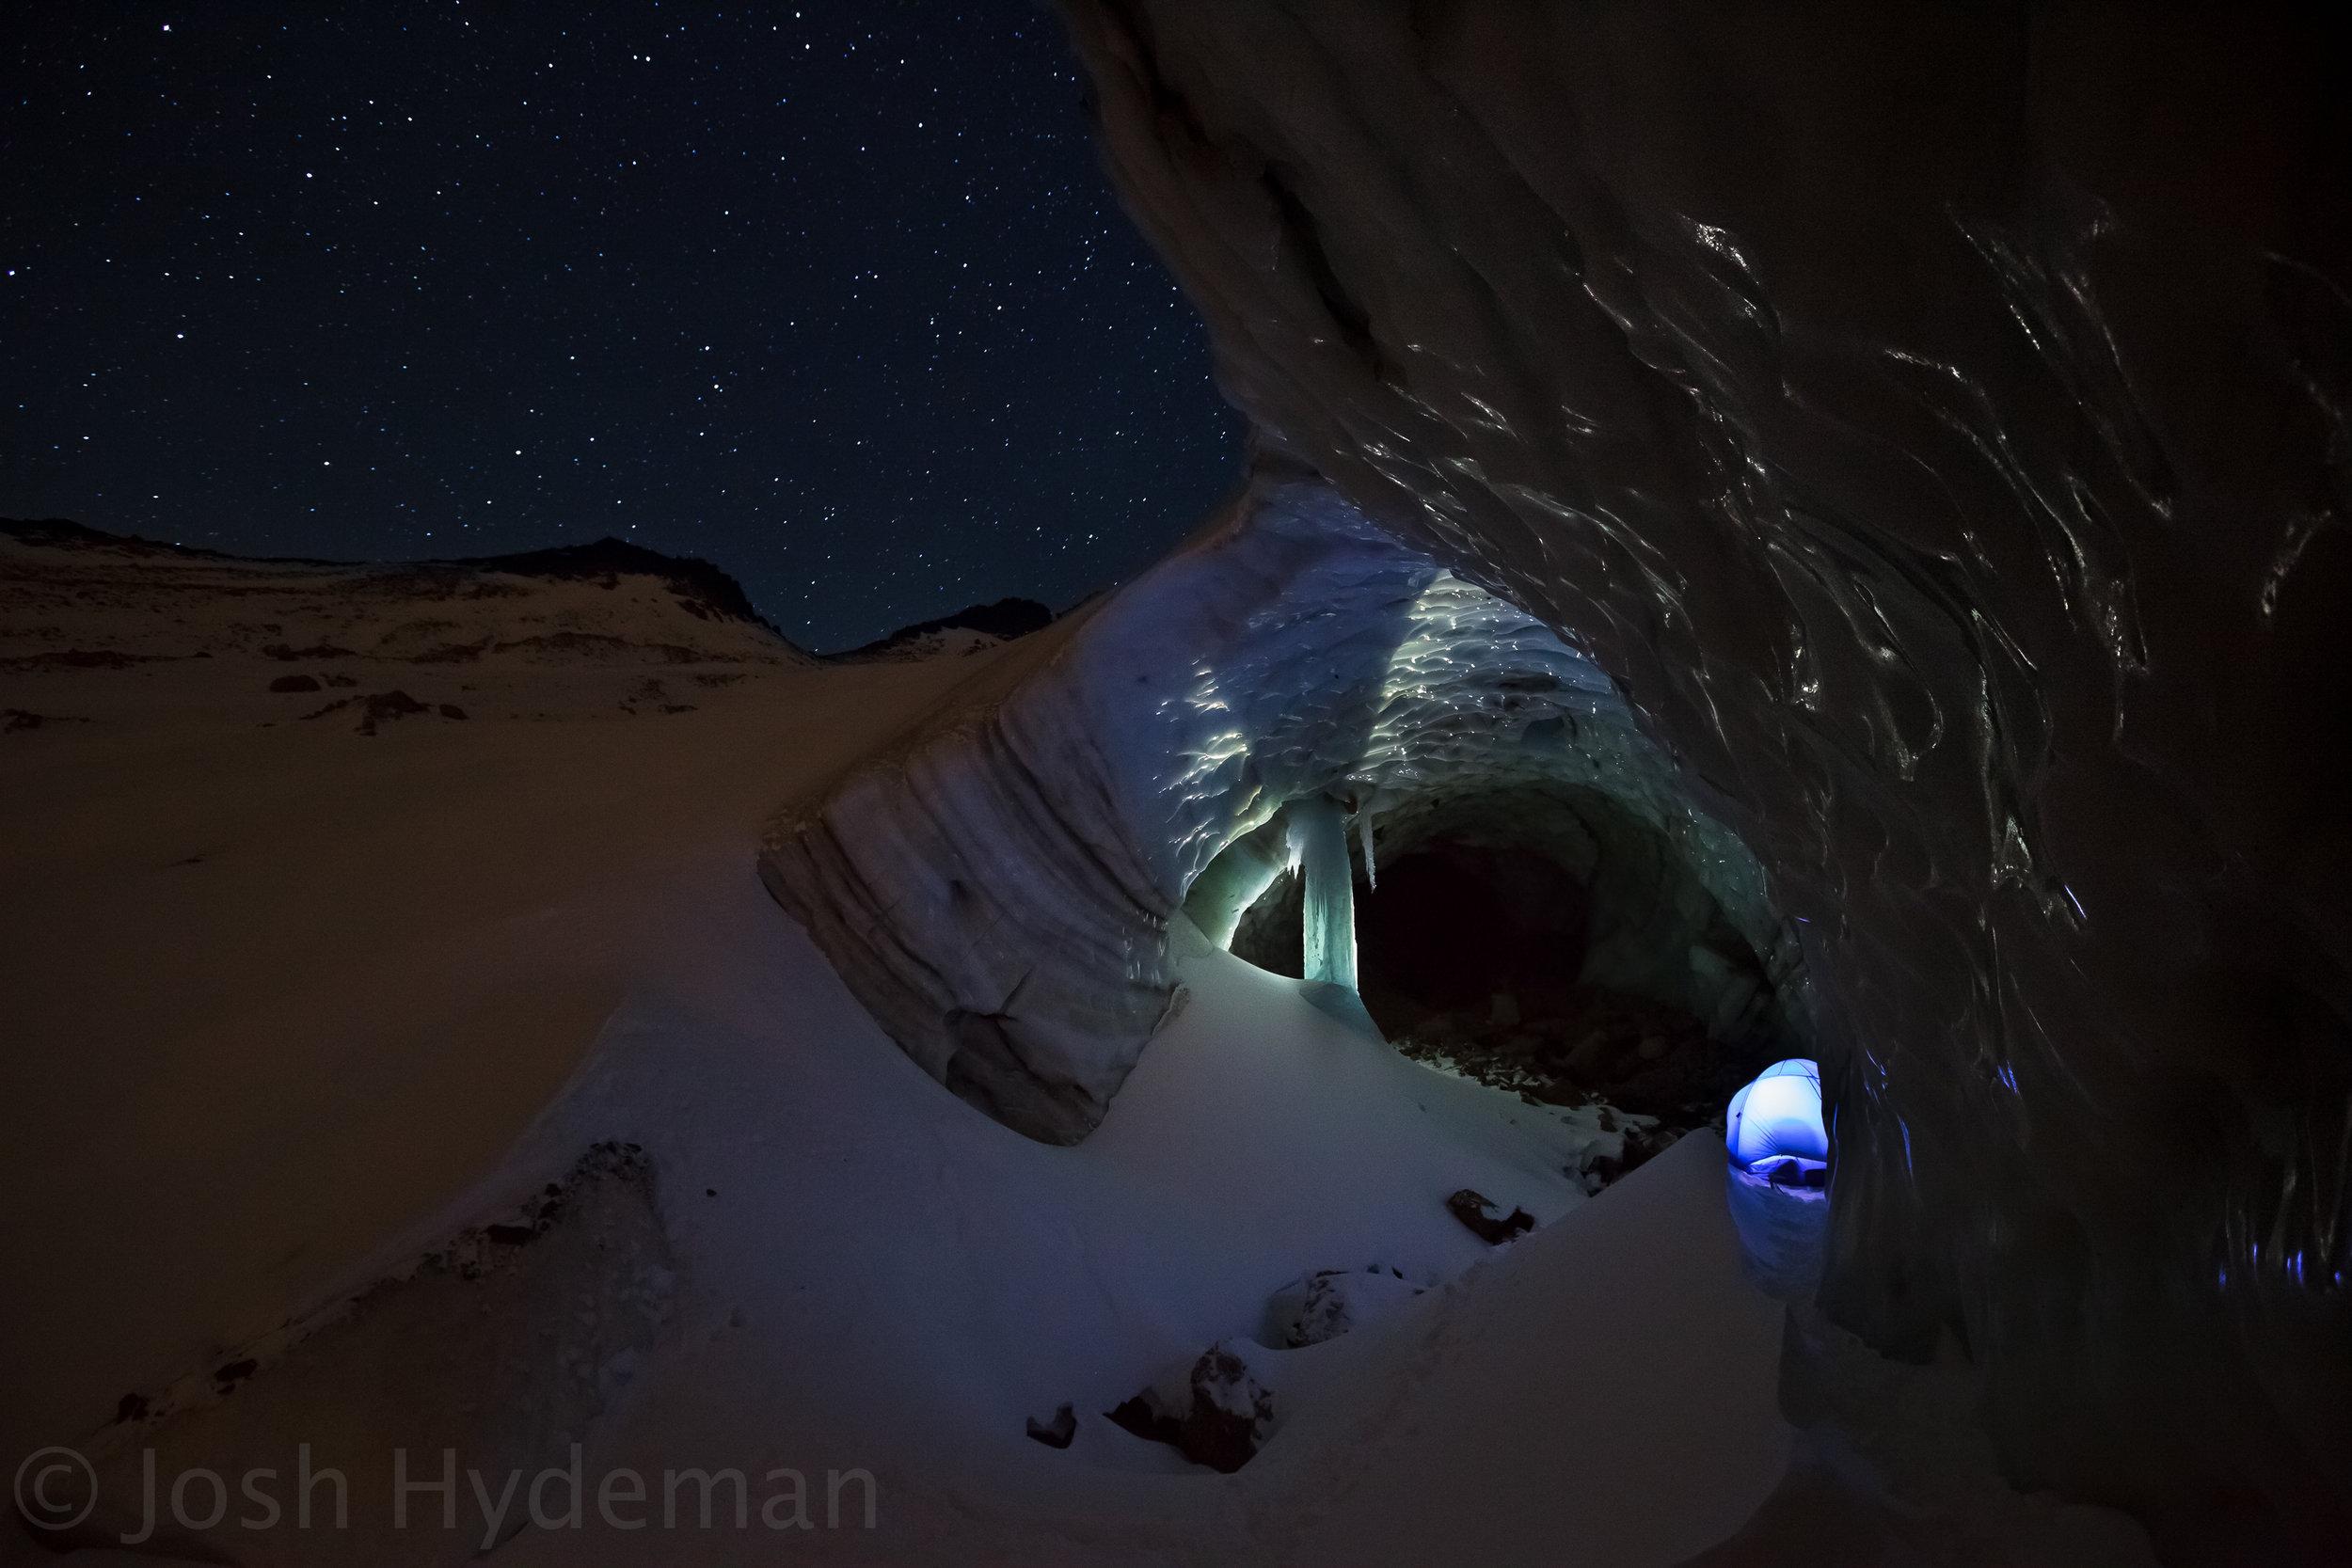 6_Hydeman_Mountain_Life_sunrsise_in_snowdragon-9847.jpg